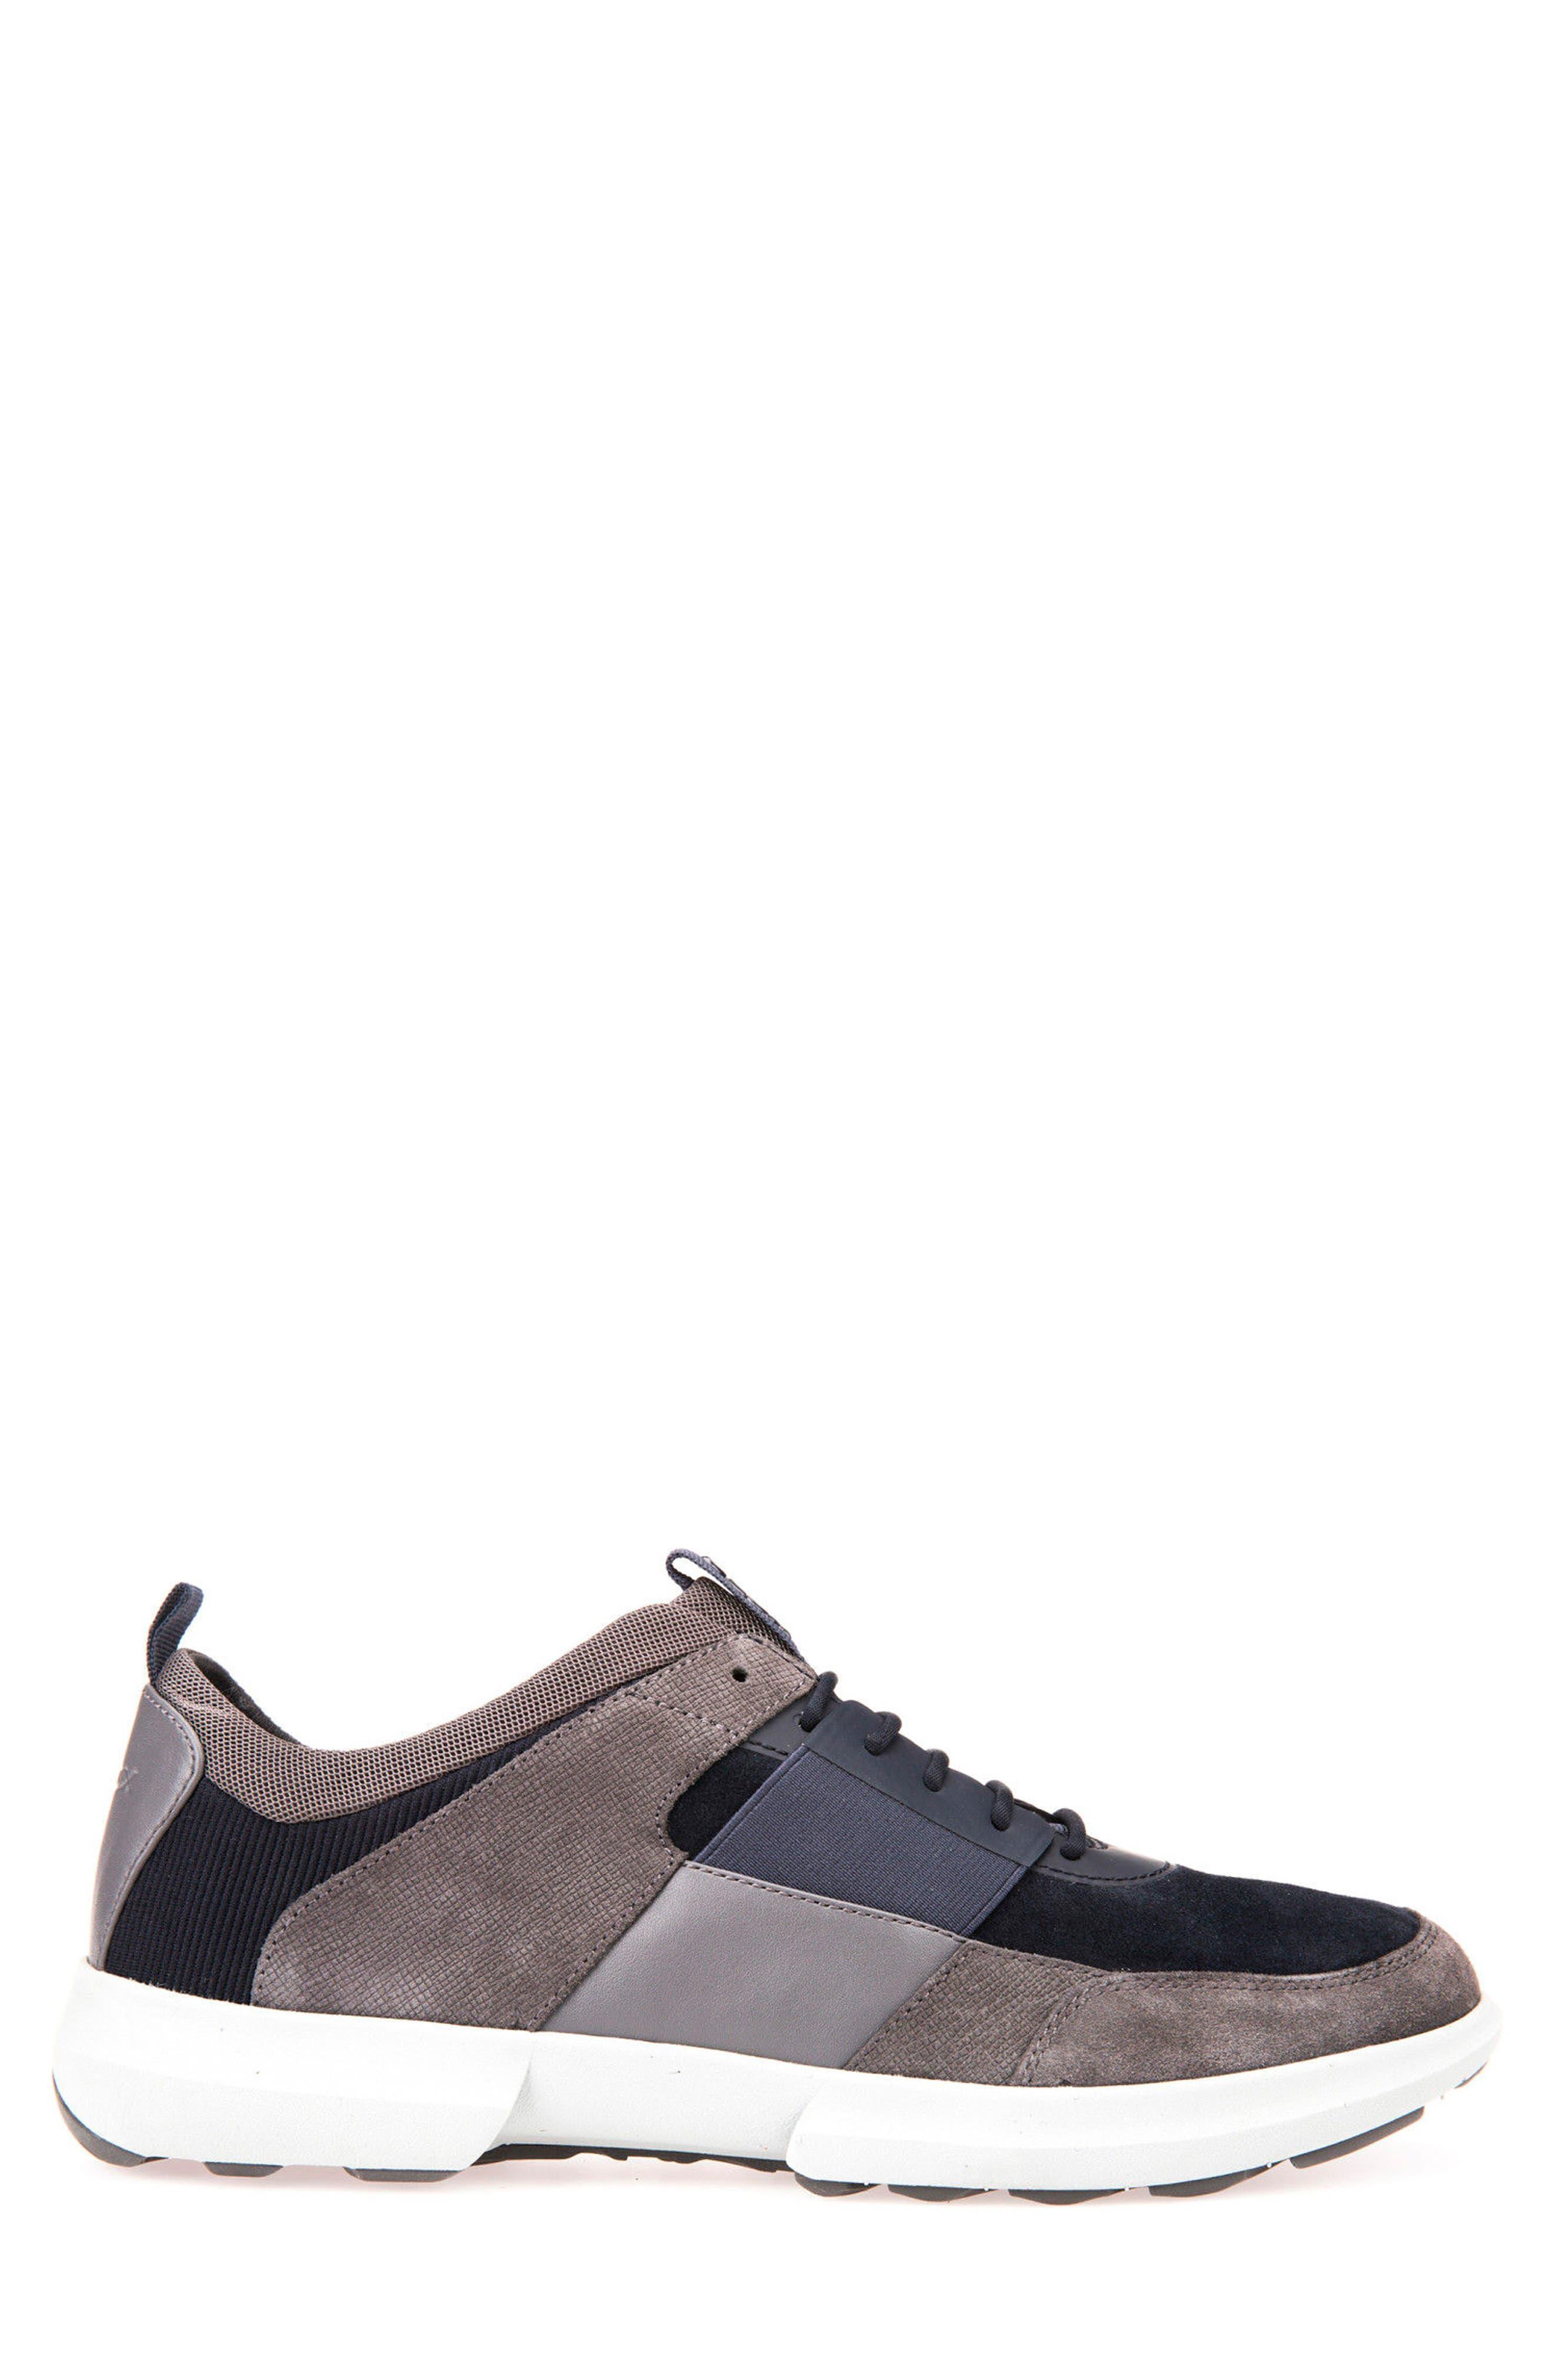 Traccia 5 Sneaker,                             Alternate thumbnail 3, color,                             Navy/ Anthracite